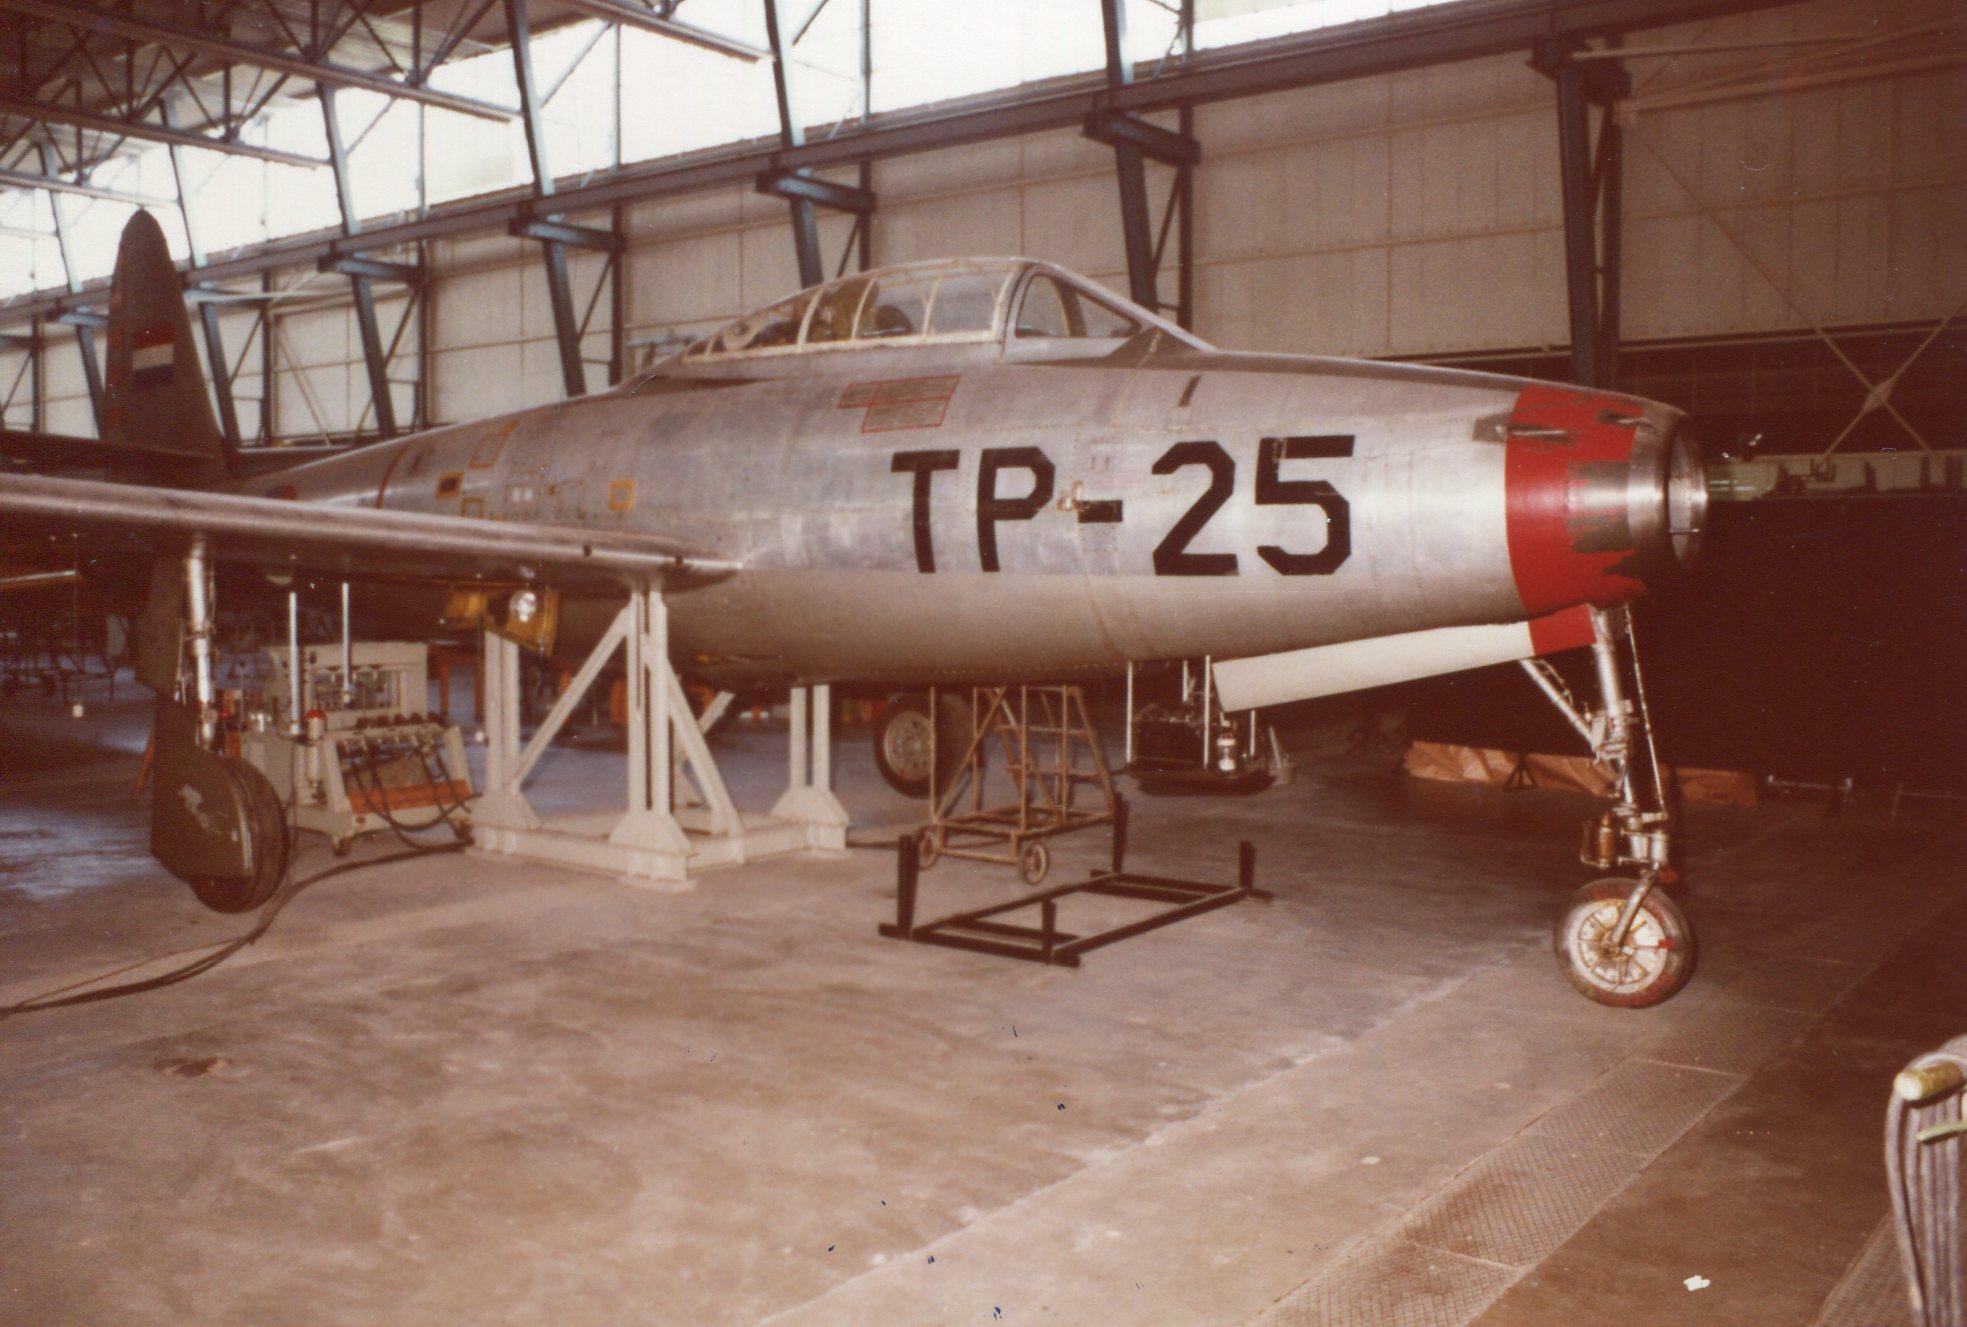 Naam: TH Delft Sept. 1974.jpg Bekeken: 1576 Grootte: 320,9 KB